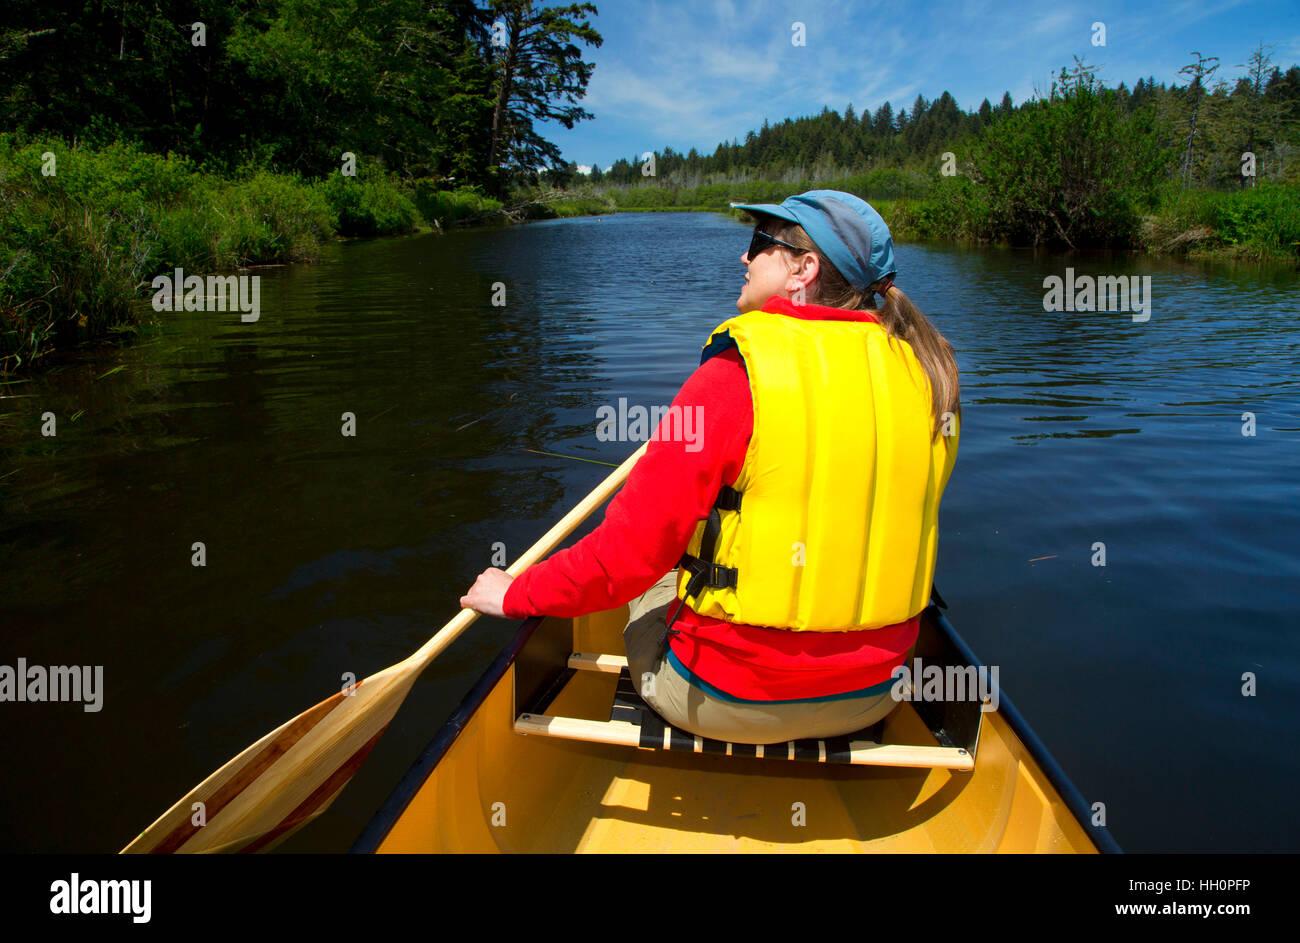 Paddle Creek Stock Photos & Paddle Creek Stock Images - Alamy